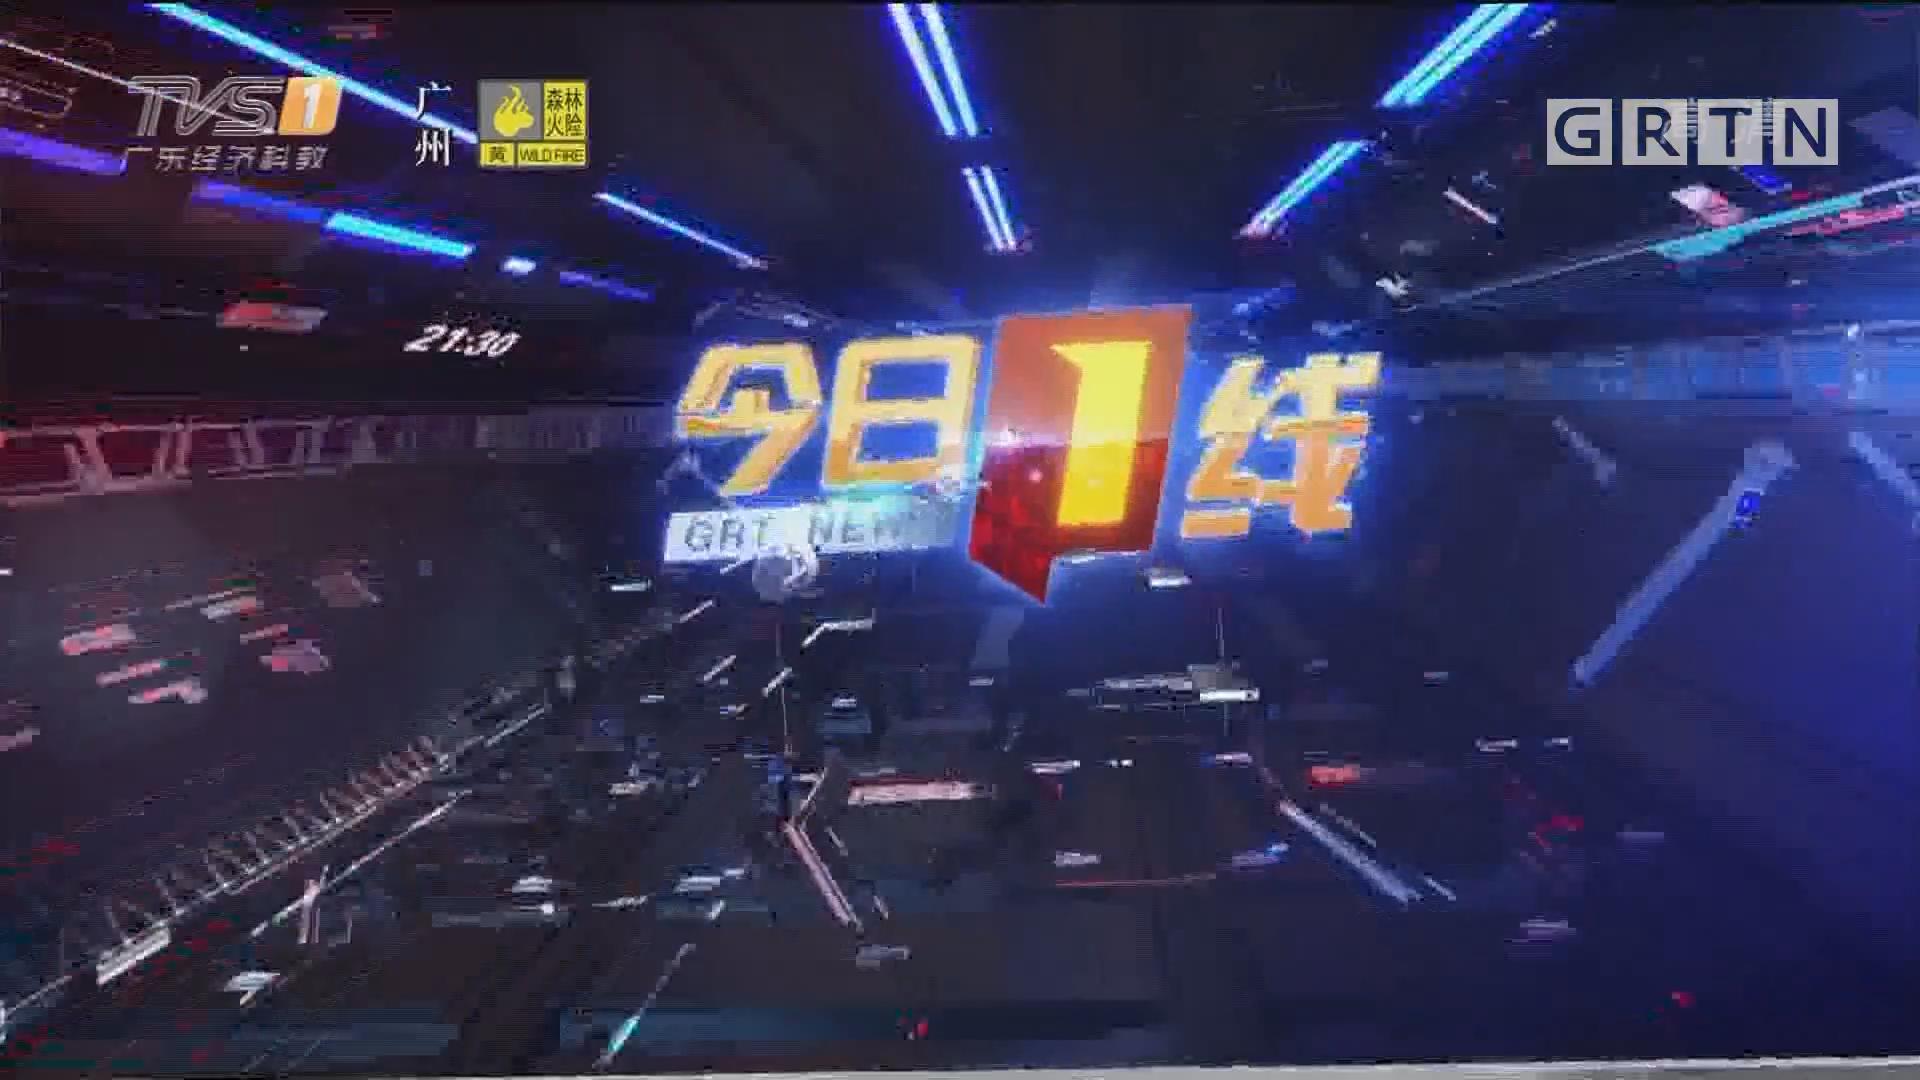 [HD][2019-10-16]今日一线:东莞:妈妈将娃独自反锁车内 民警破窗营救